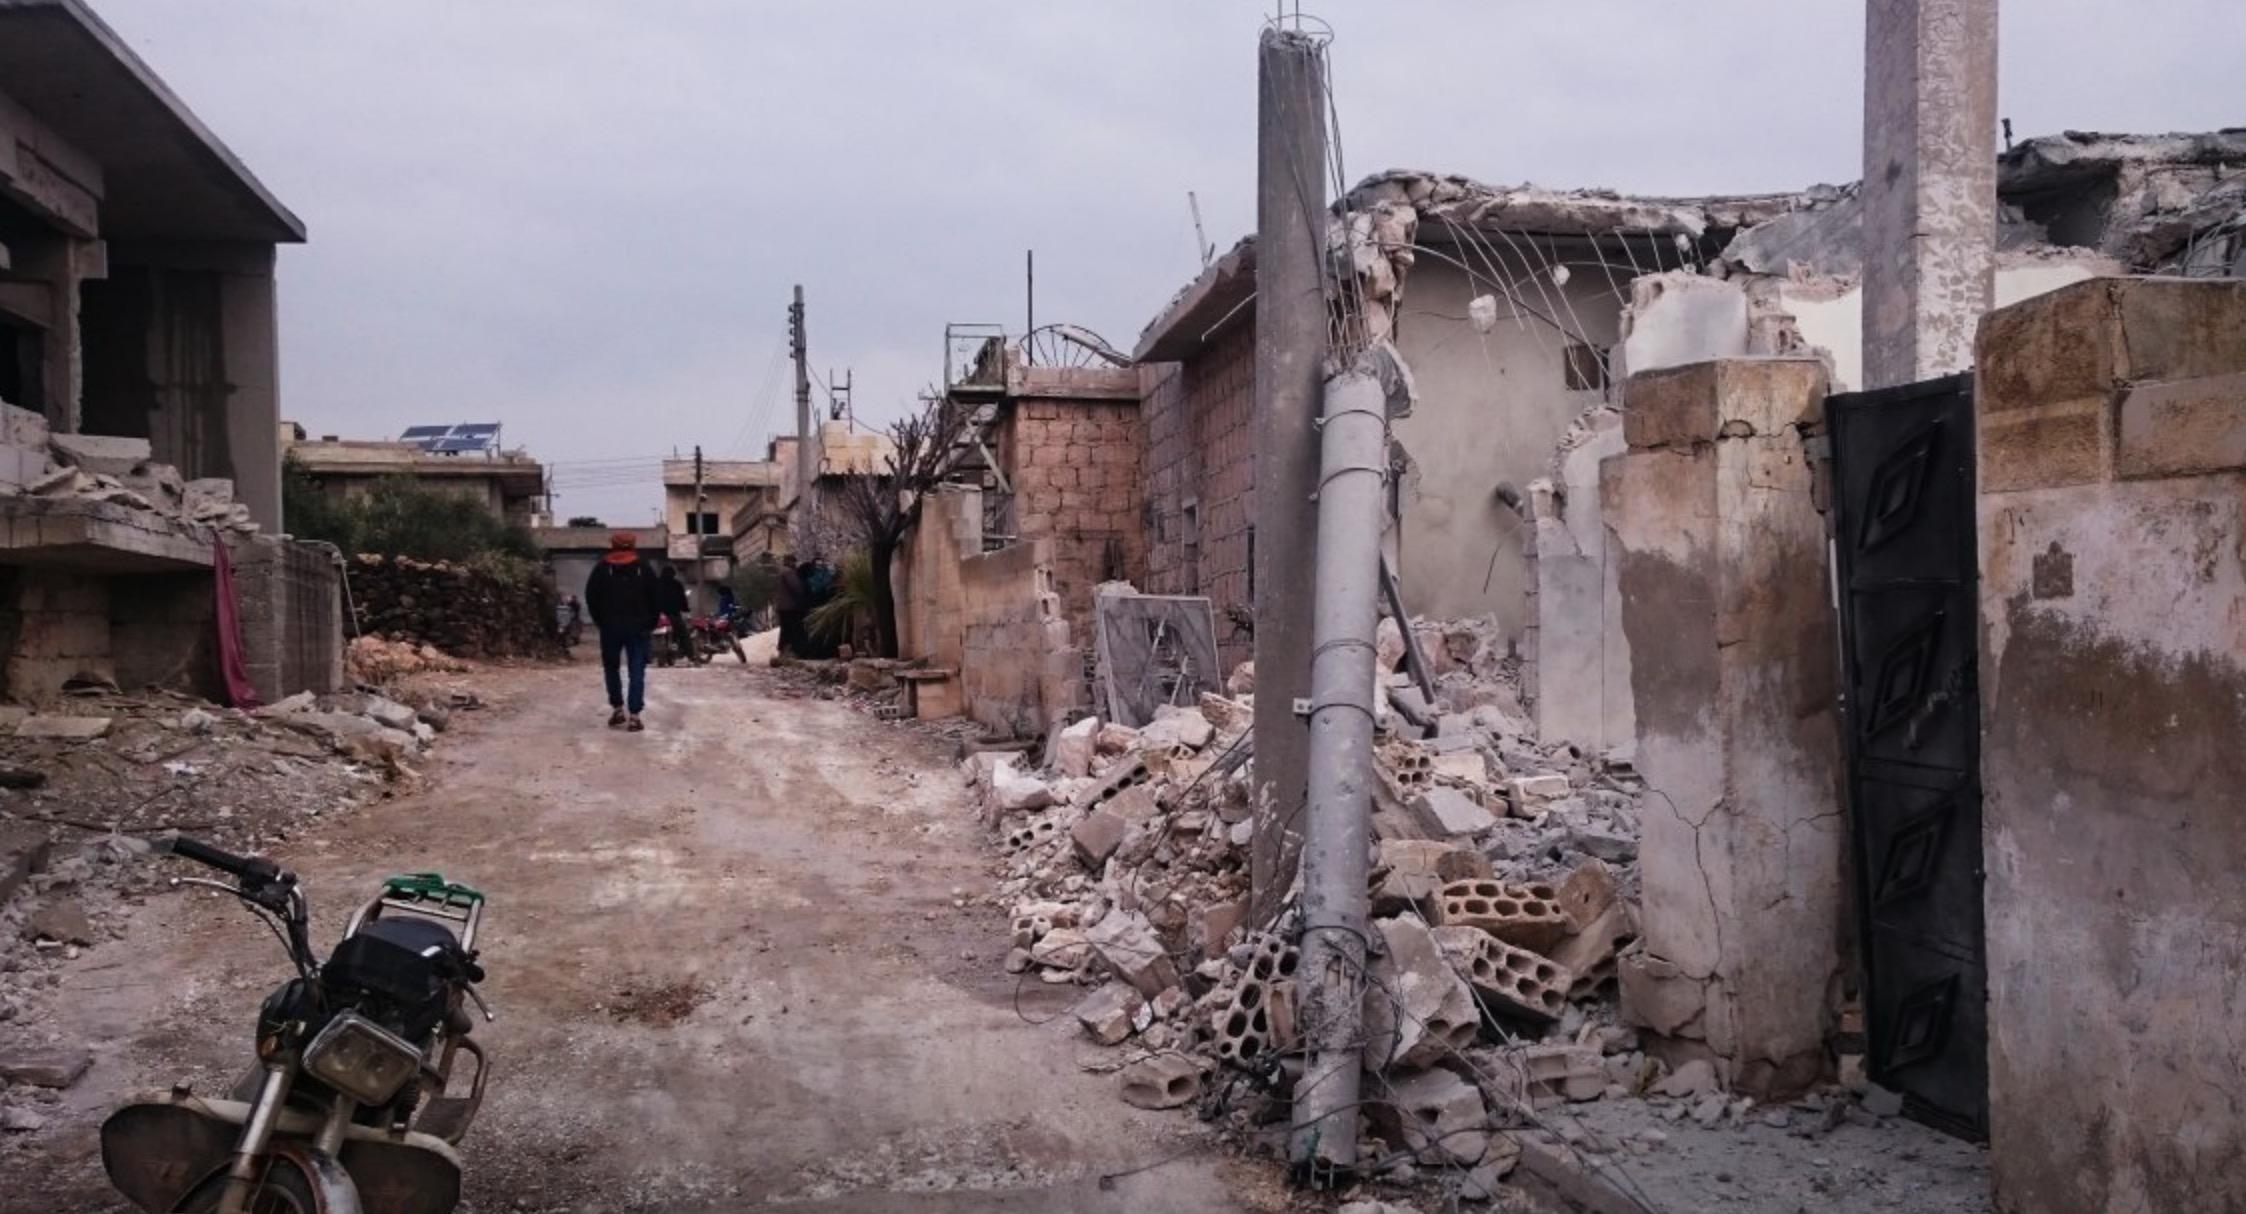 Rejimin İdlib saldırısı ve baltalanan barış süreci